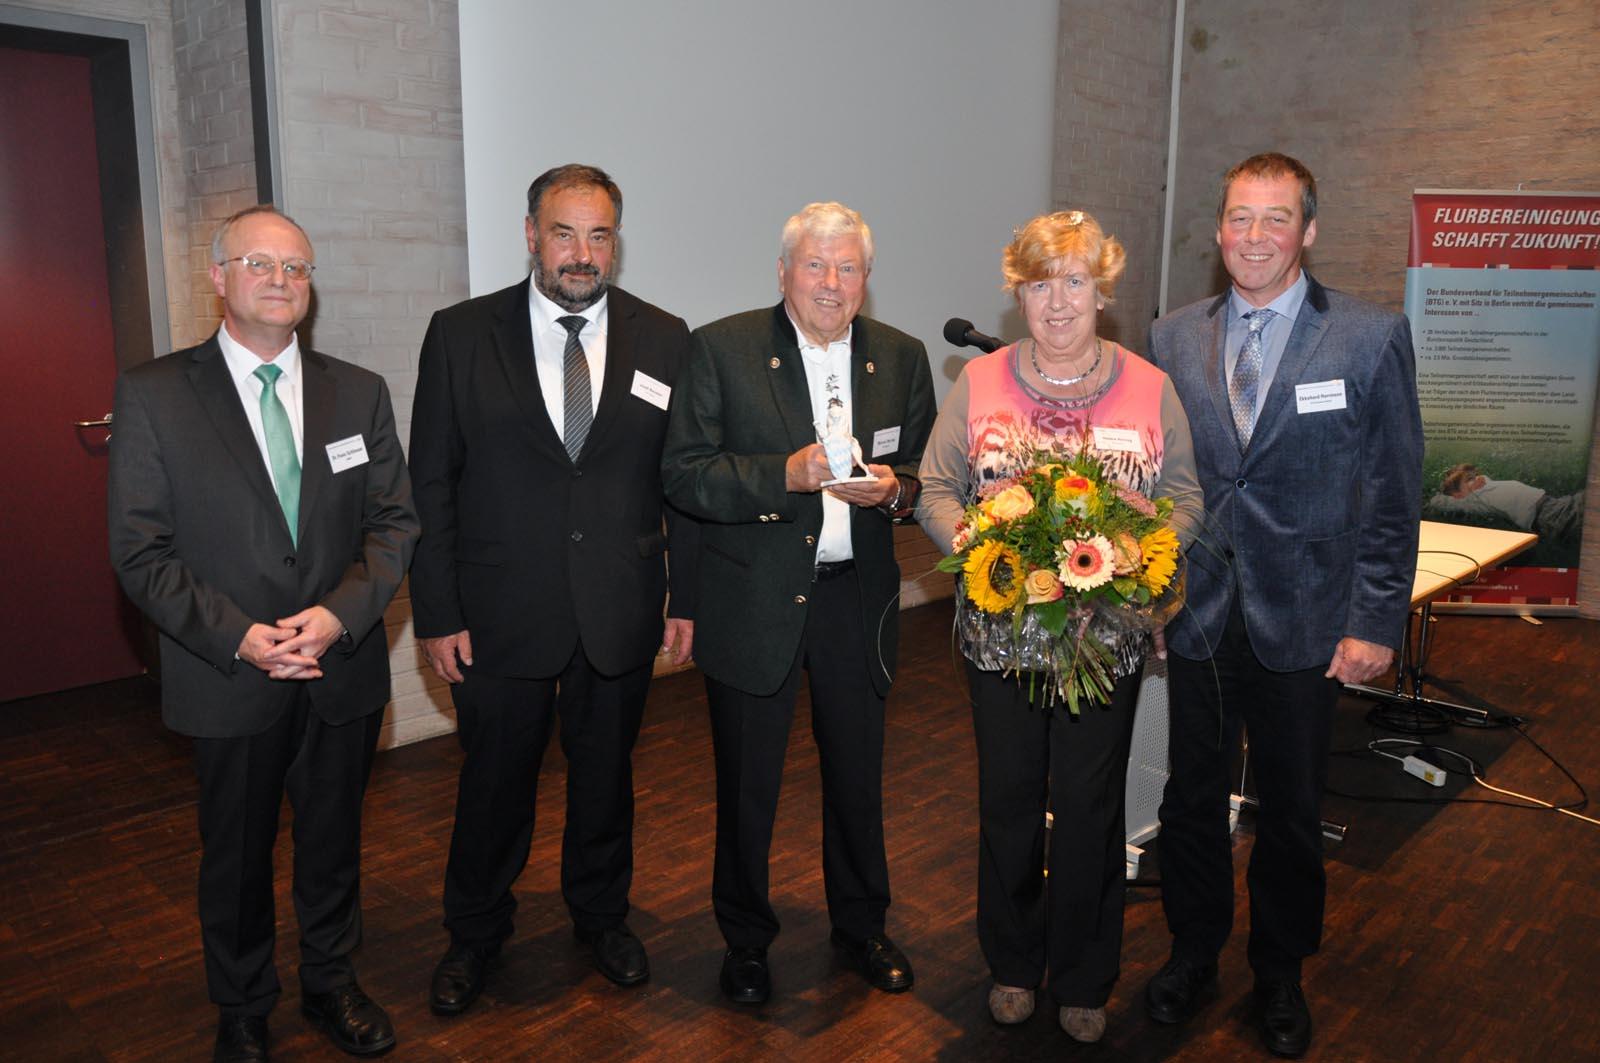 von links: Ministerialrat Dr. Franz Schlosser, Vorsitzender des LVLE Bayern Josef Beimler, Werner Herzog, Hanna Herzog, Präsident des BTG e.V. Ekkehard Horrmann